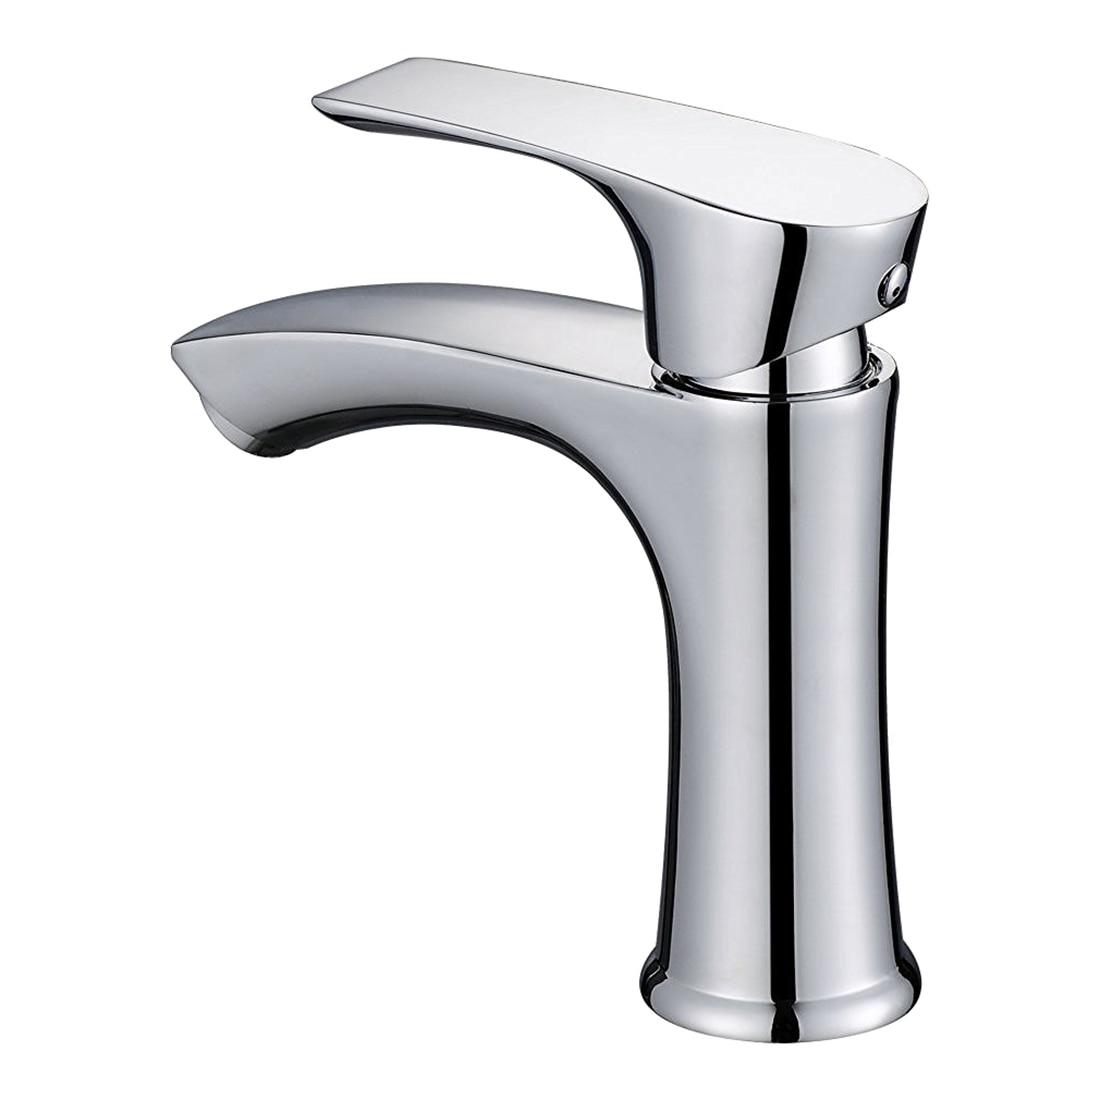 Bathroom Faucet Types faucet types bathroom promotion-shop for promotional faucet types